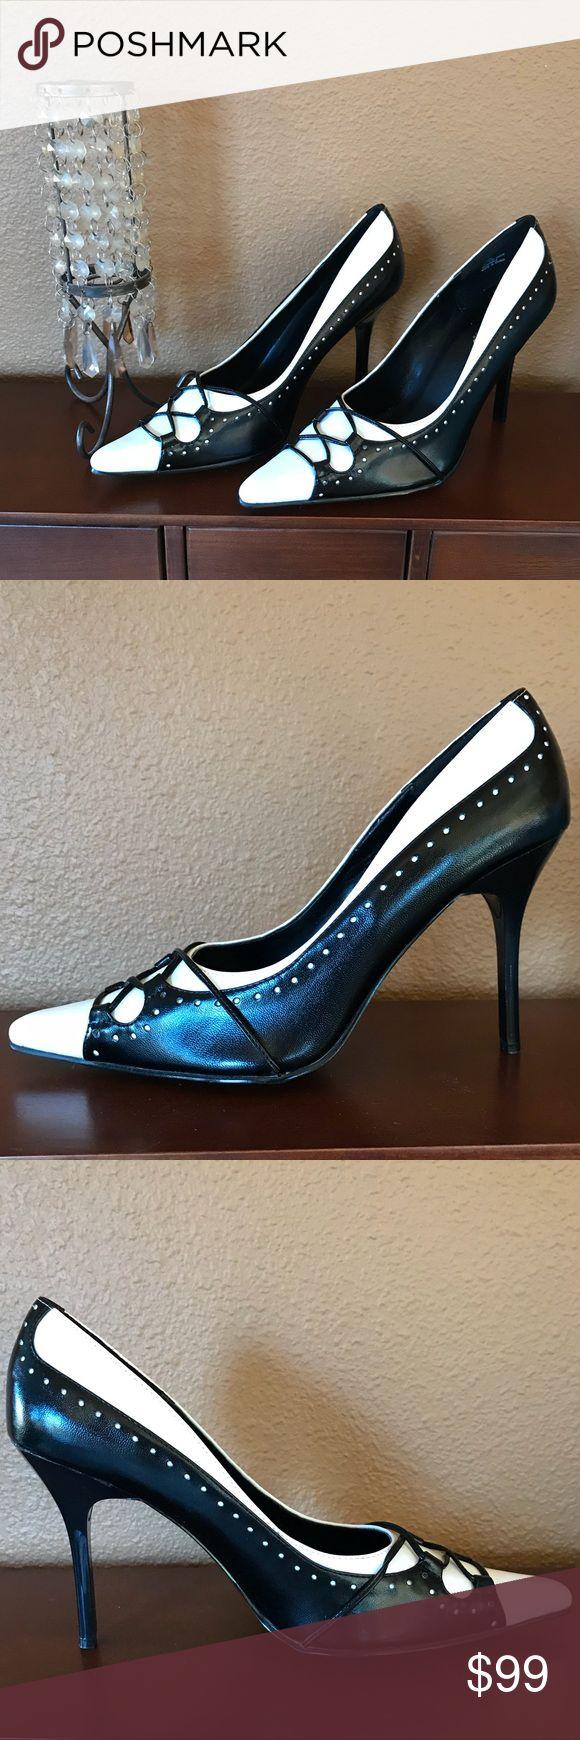 Fredericks of Hollywood tuxedo heels, sz. 9.5M Fredericks of Hollywood tuxedo stiletto, sz. 9.5M. Like new!! Frederick's of Hollywood Shoes Heels